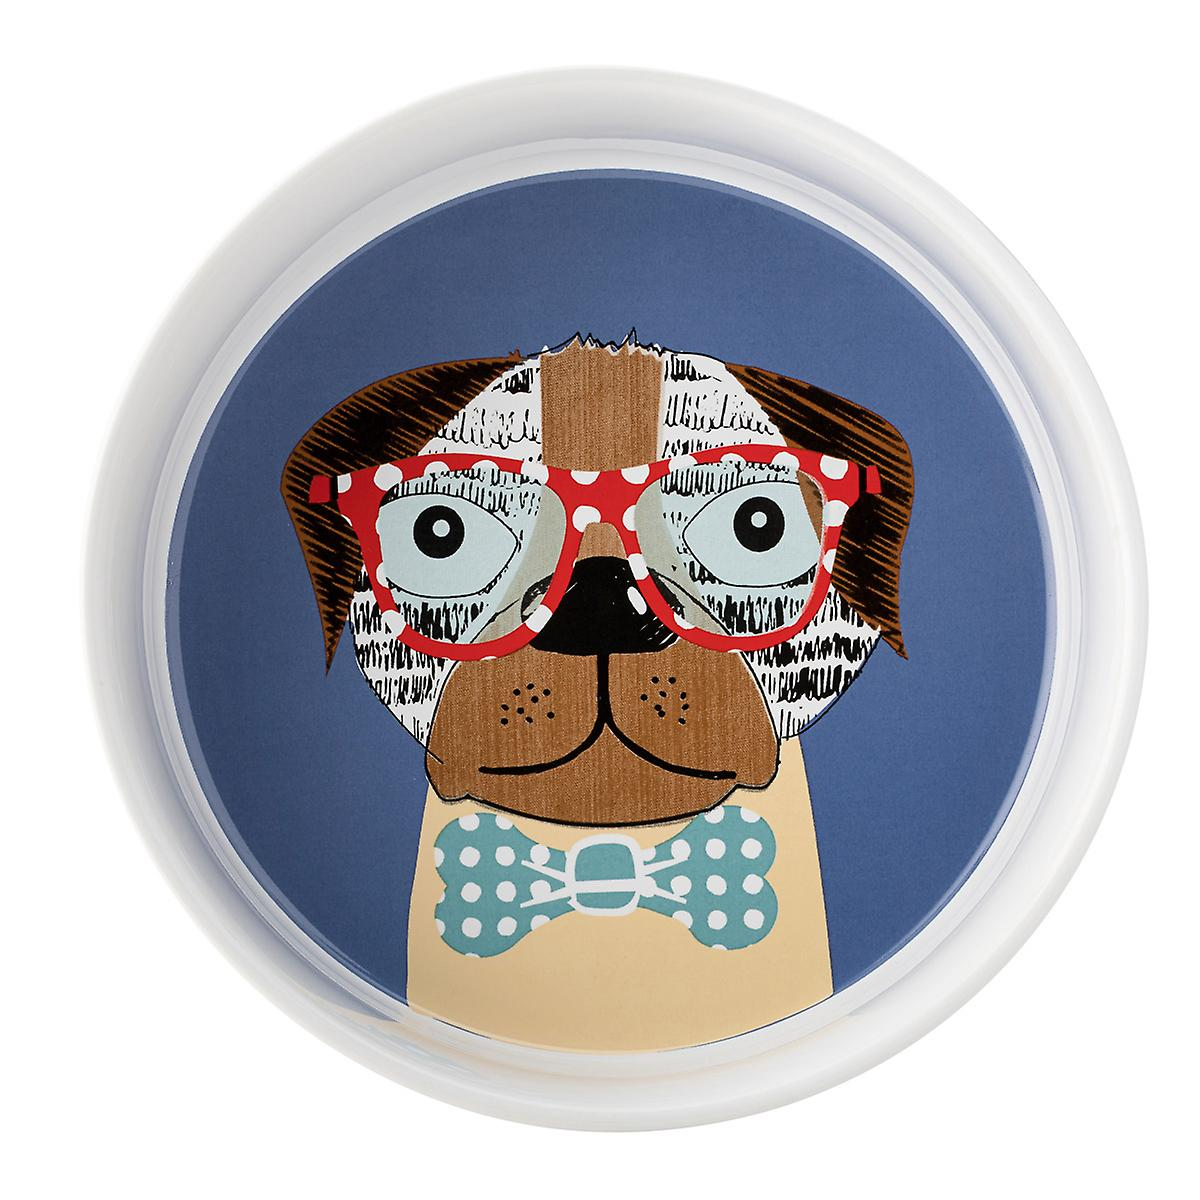 English Tableware Co. Perfect Pets Large Bowl, Dashing Dog